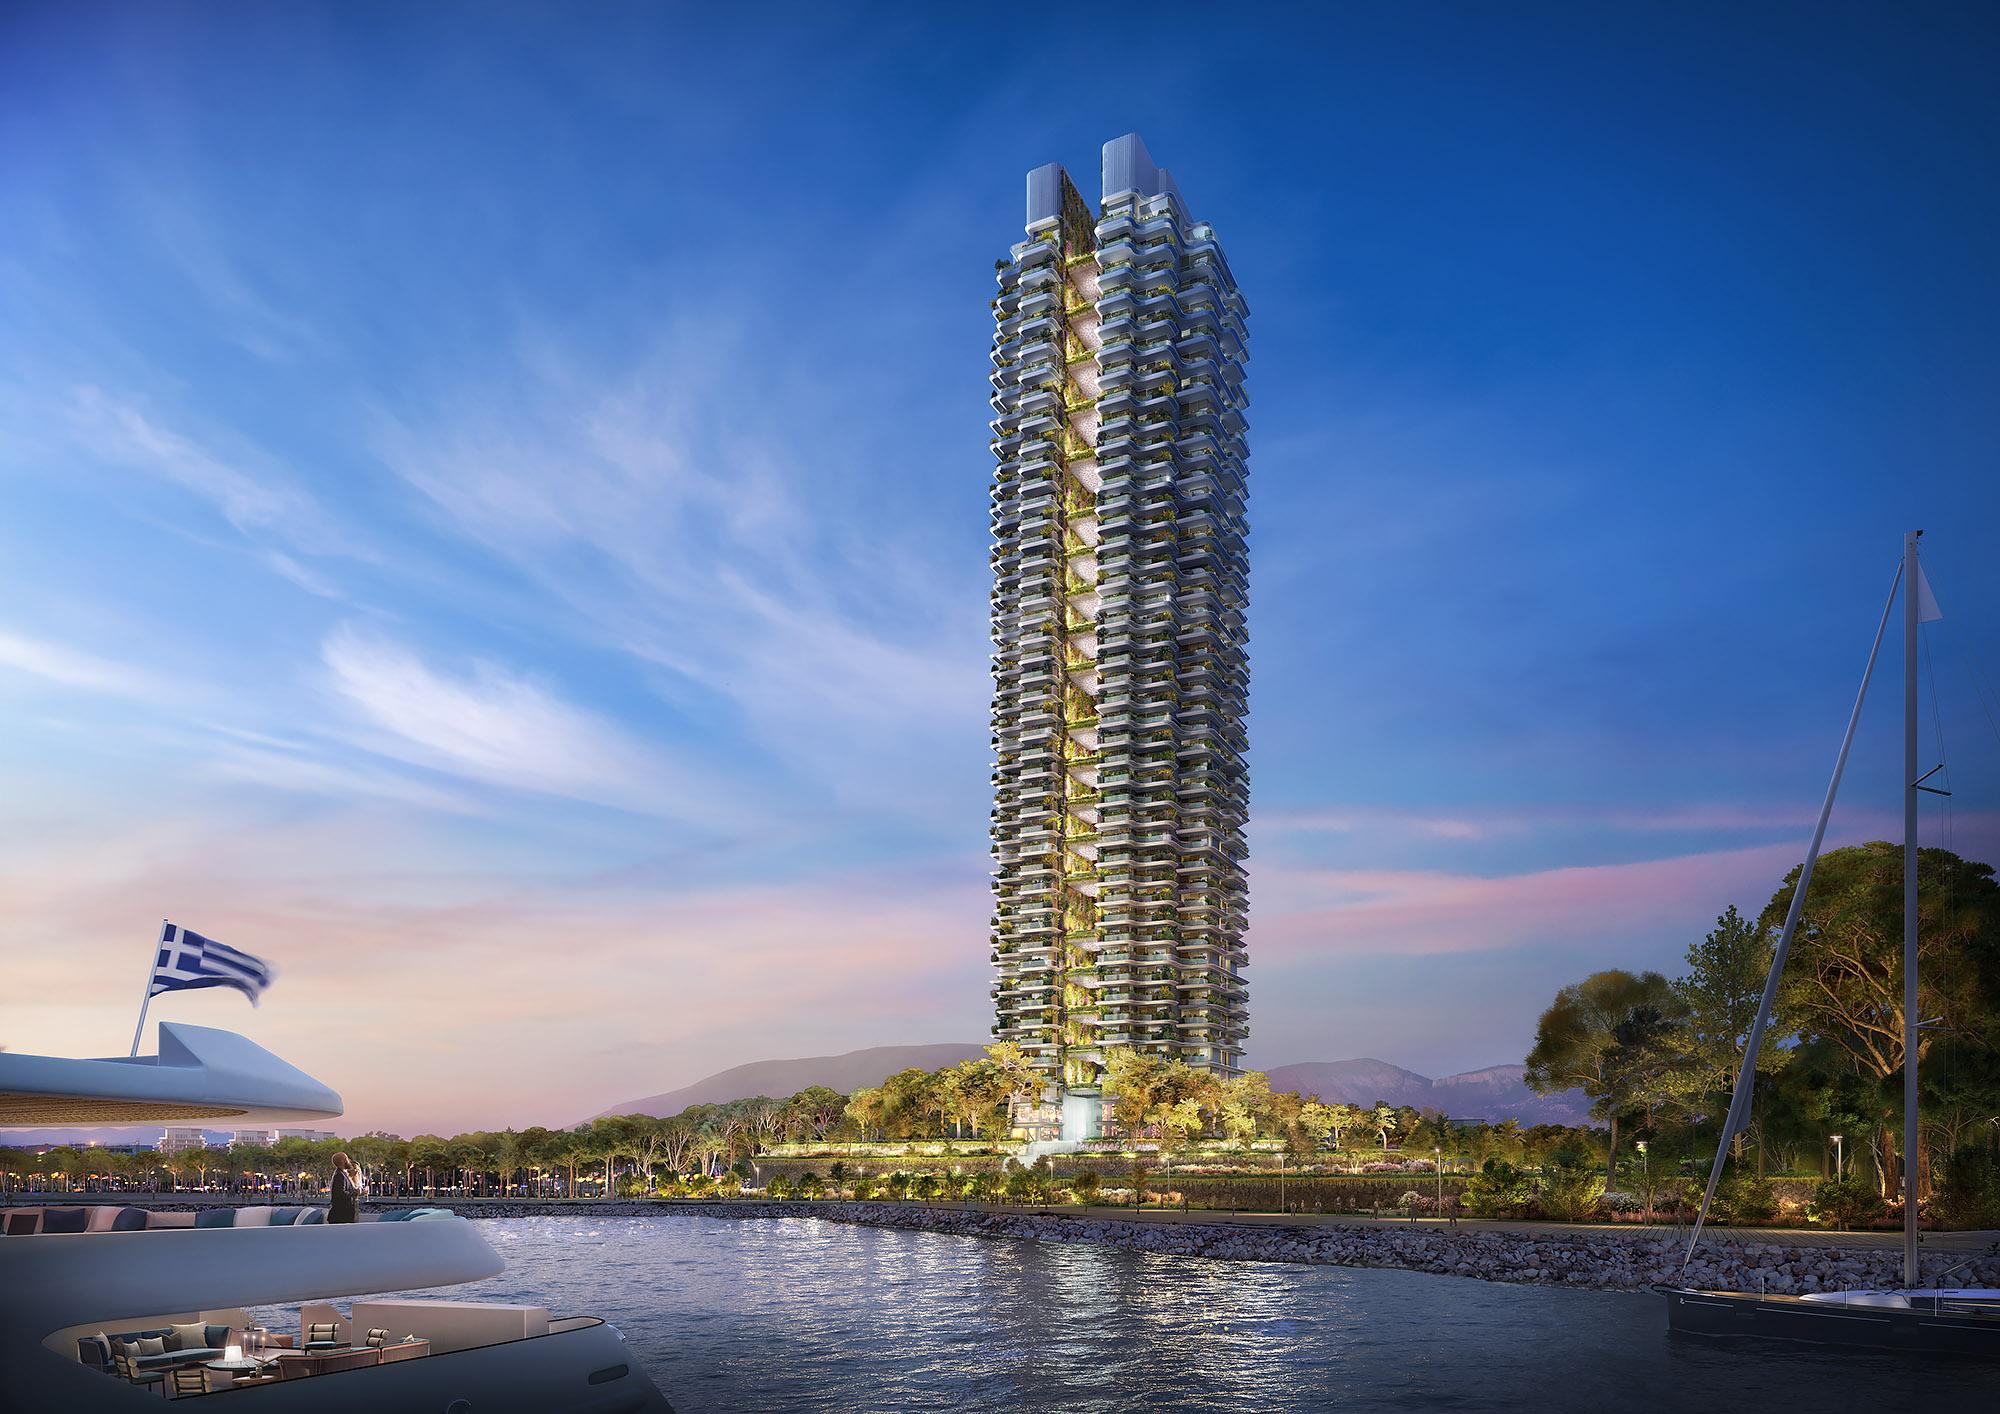 Lamda Development: Στο Ελληνικό ο πρώτος ουρανοξύστης της Ελλάδας